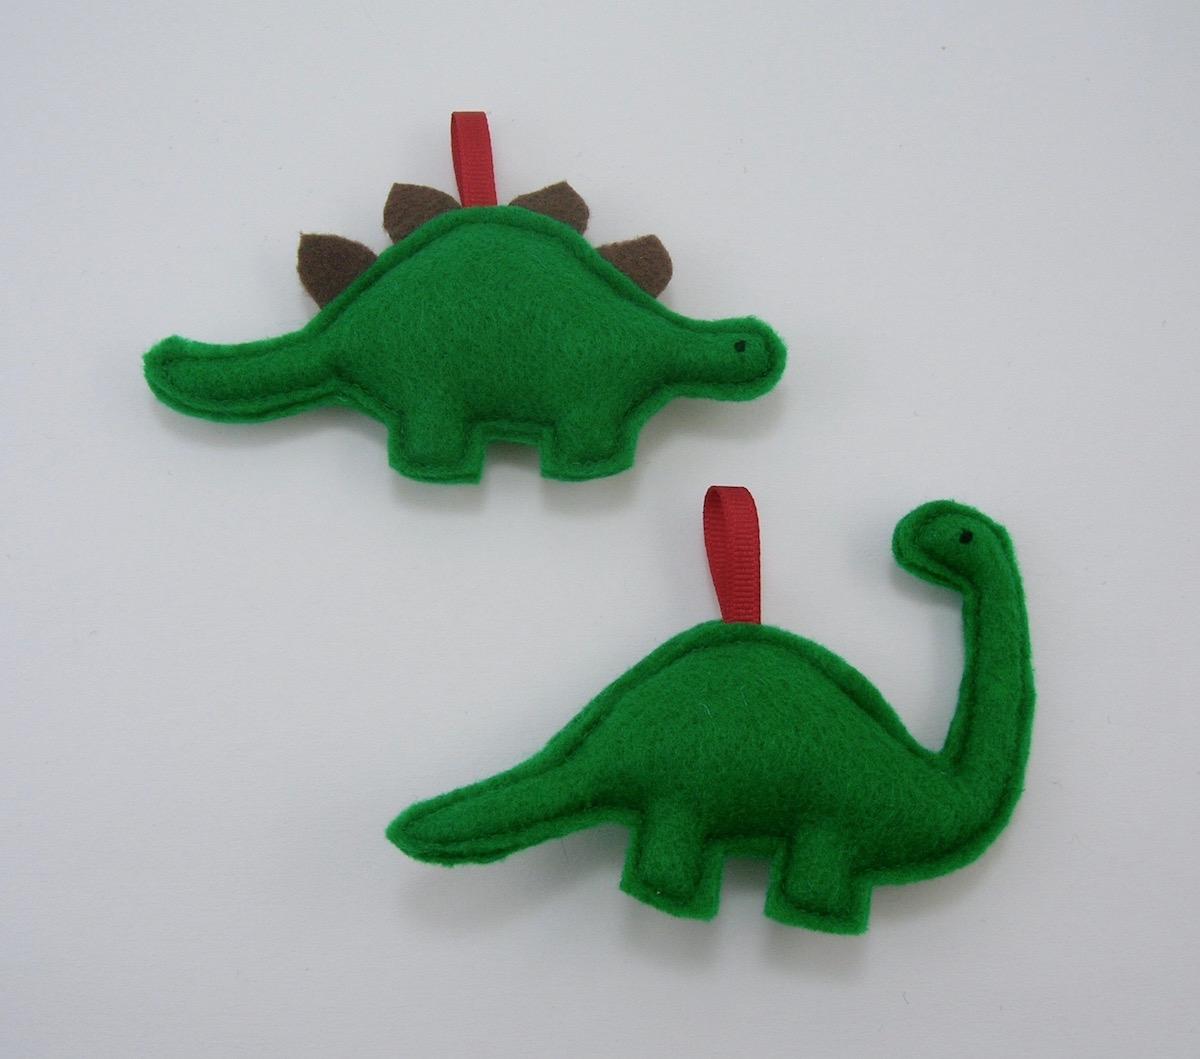 Dinosaur christmas ornaments - Dinosaur Christmas Ornament Set Stegosaurus And Brontosaurus